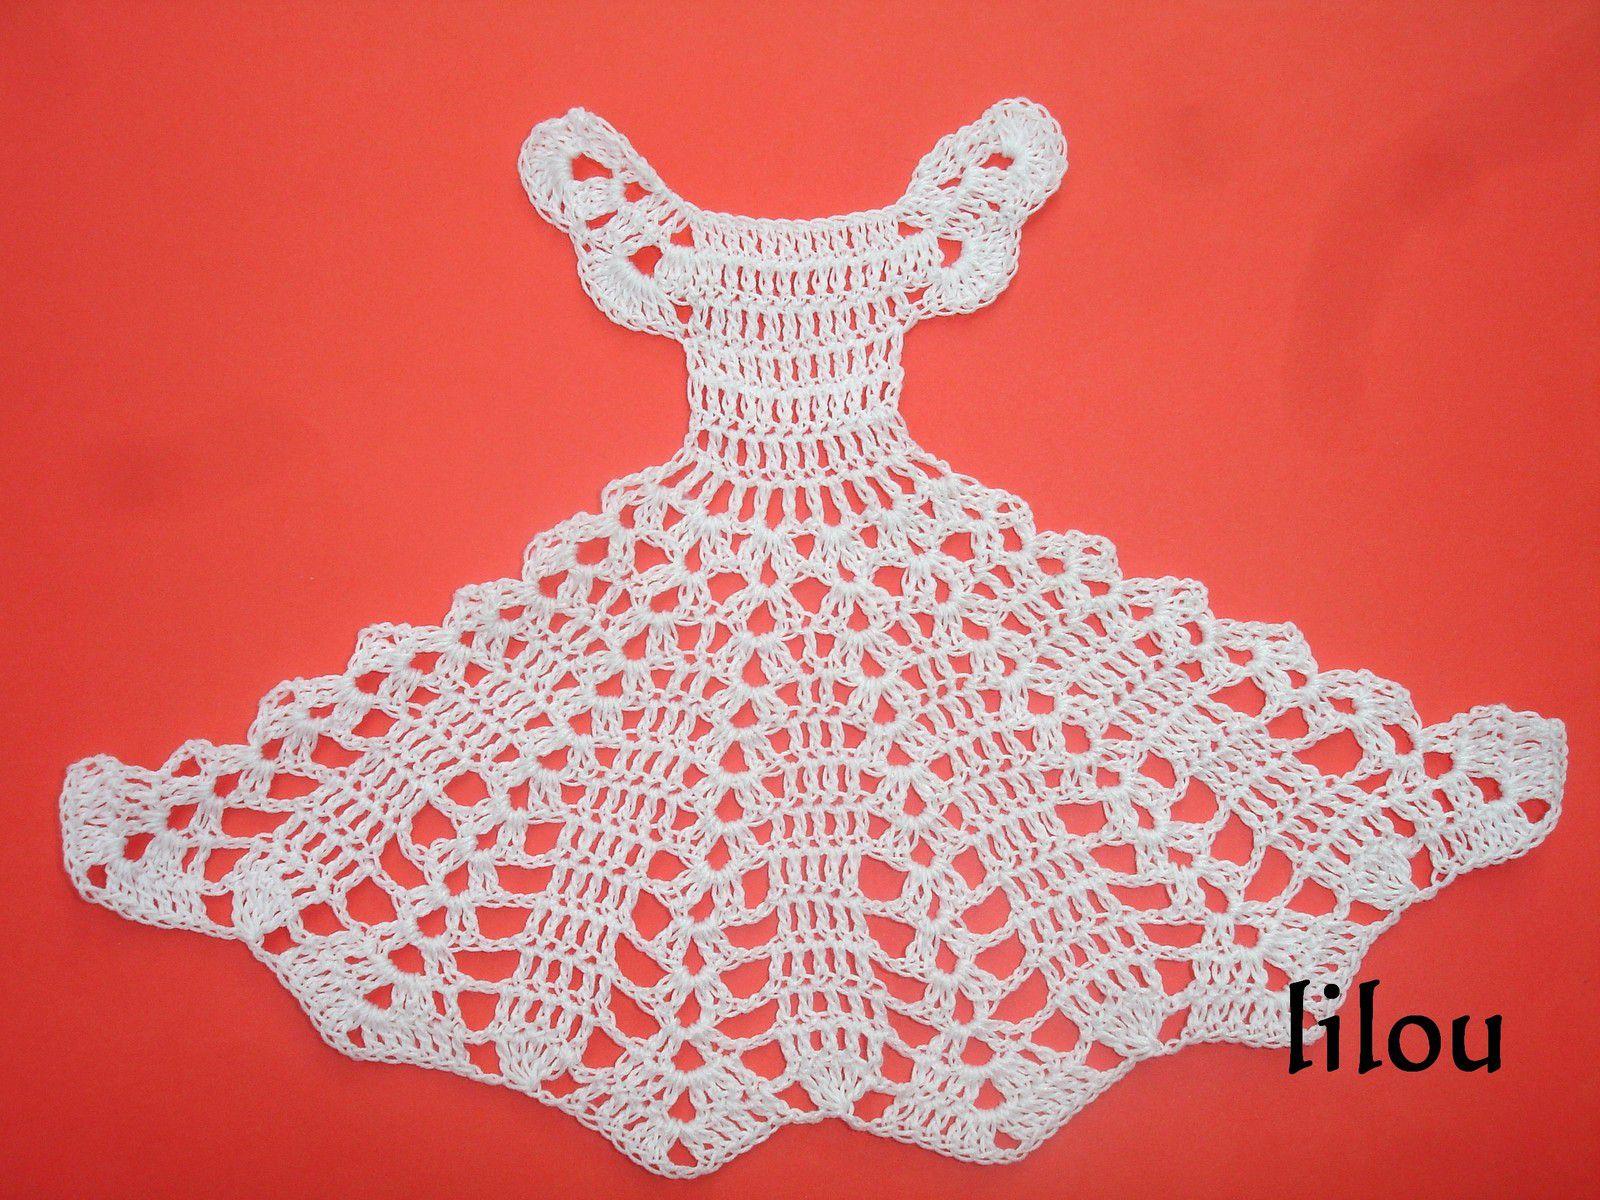 Petit robe au crochet DIY modele tuto gratuit